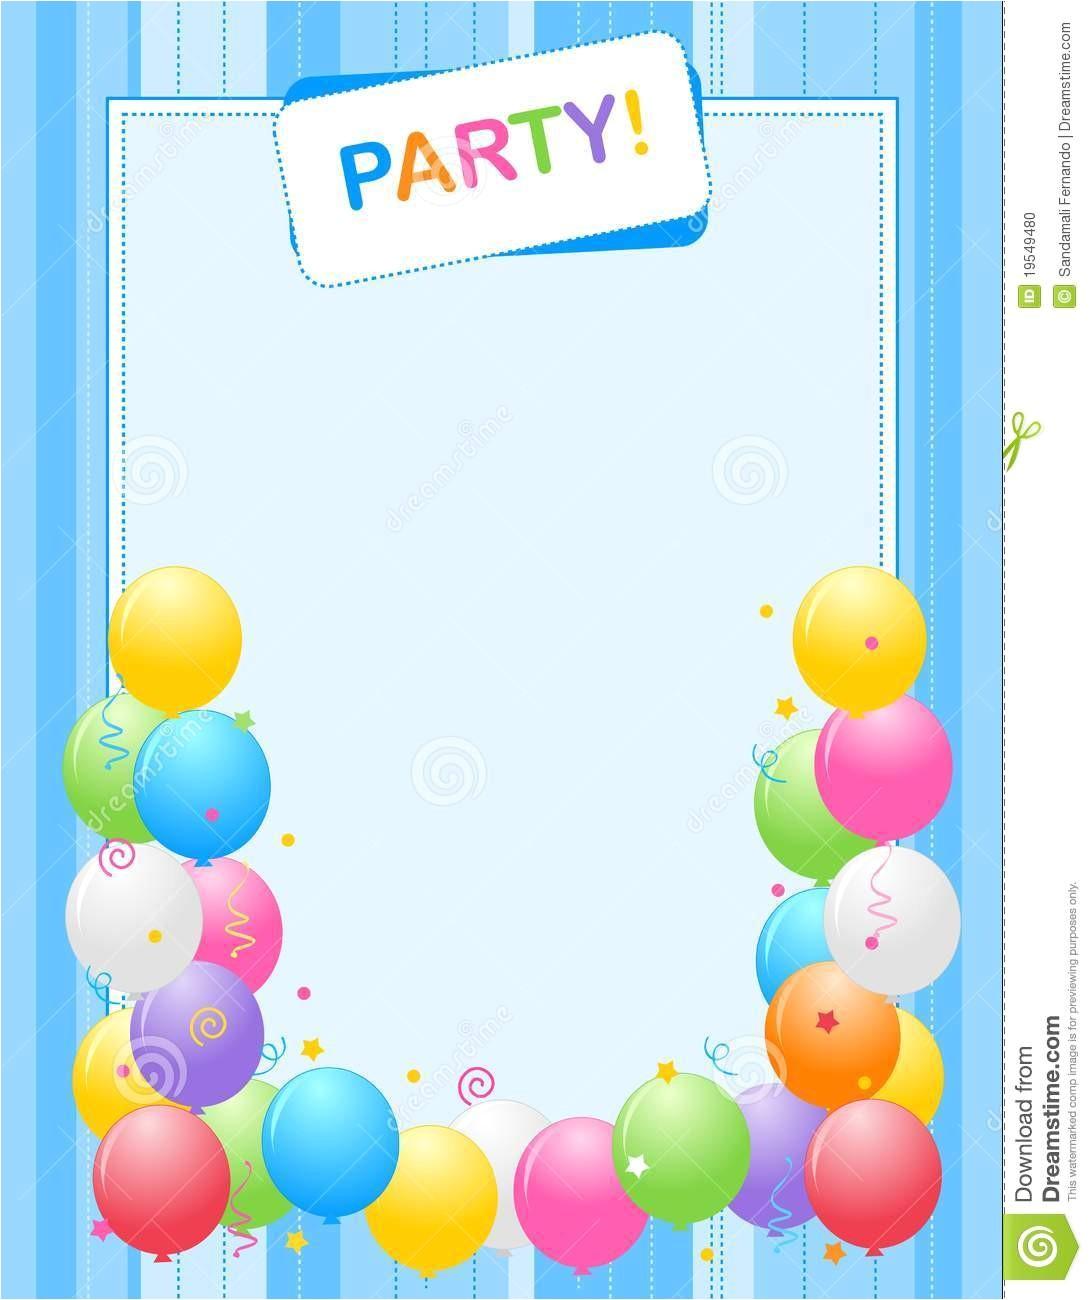 stock photo party invitation frame image